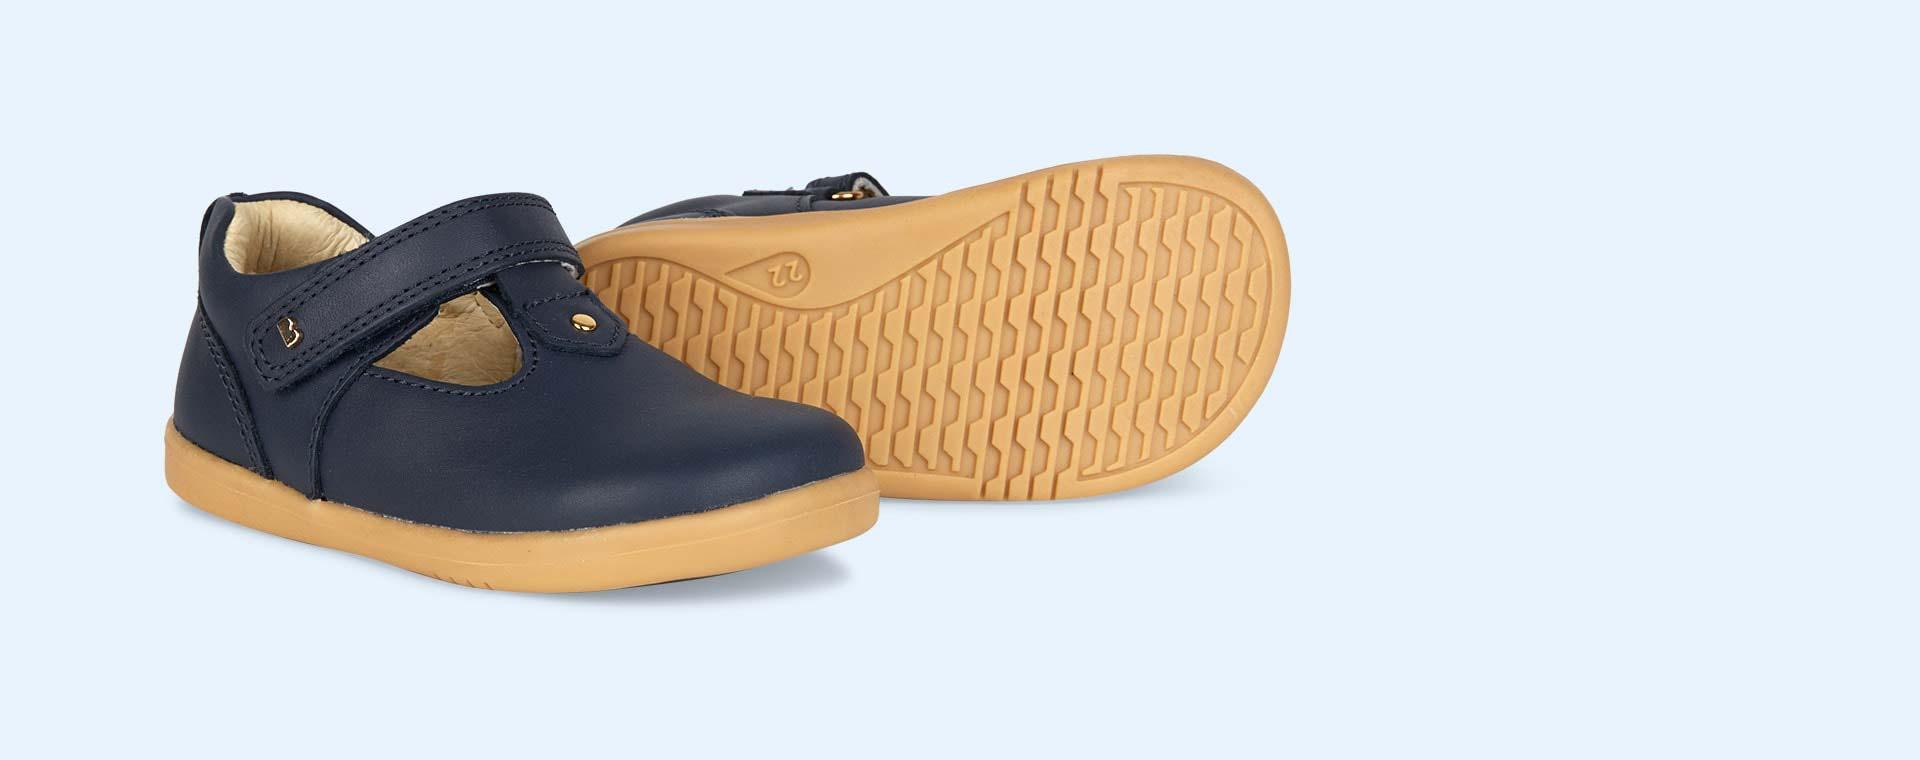 Navy Bobux I-Walk Louise T-bar Shoe